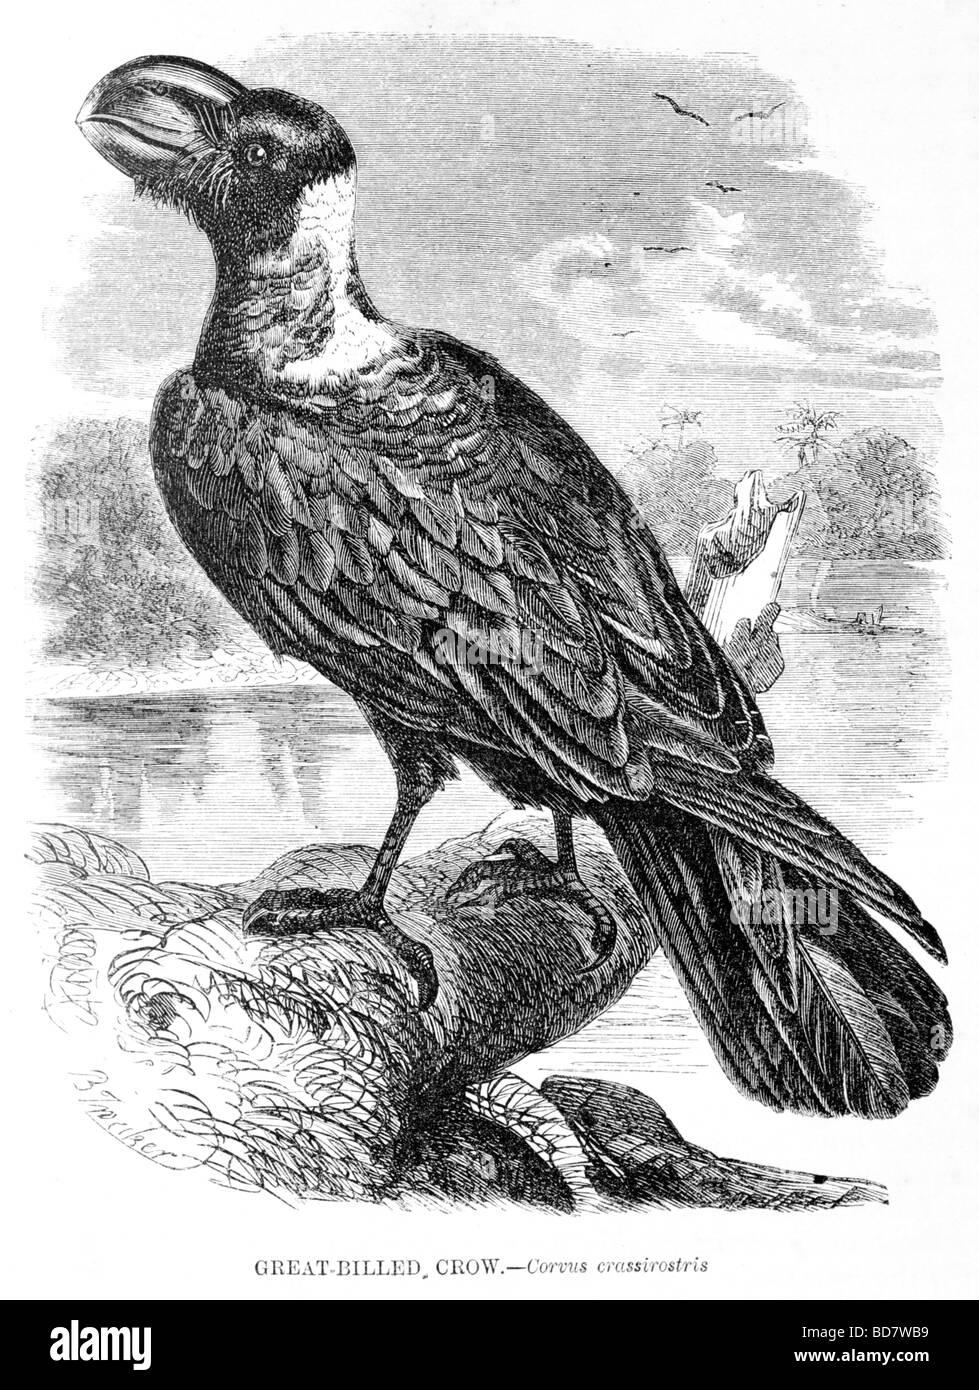 great billed crow corvus crassirostris - Stock Image